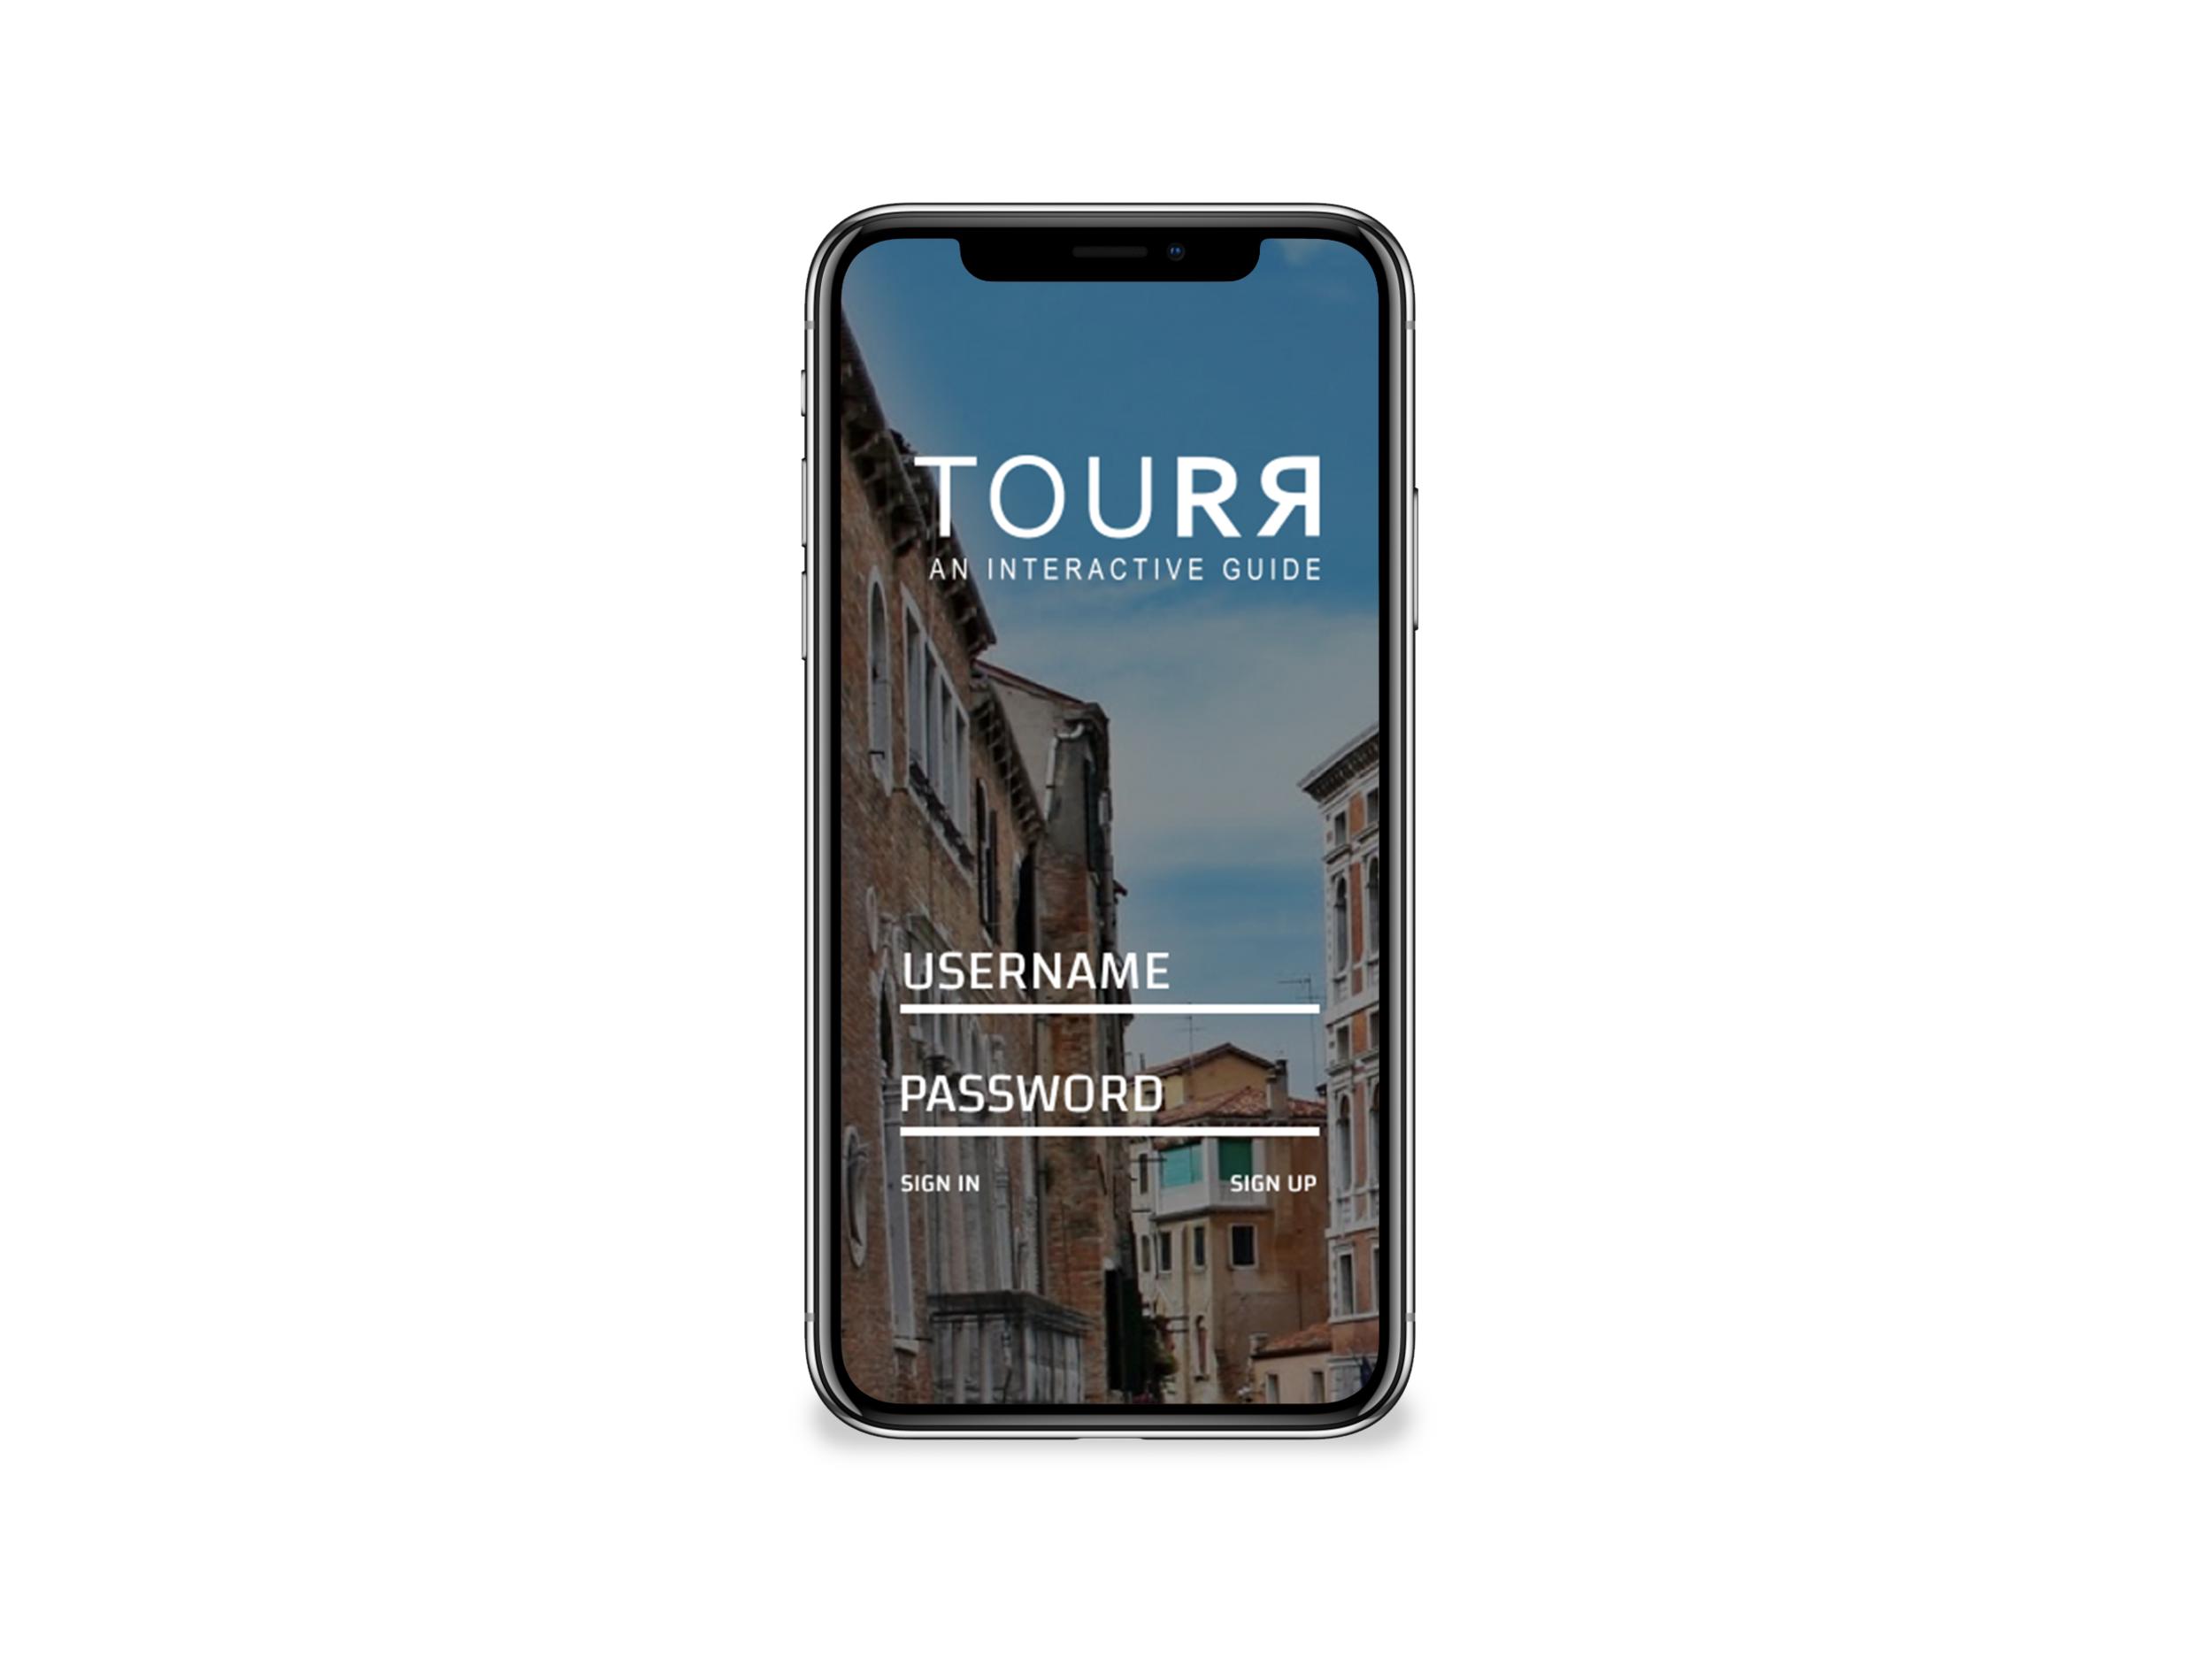 Tour: An Interactive Guide